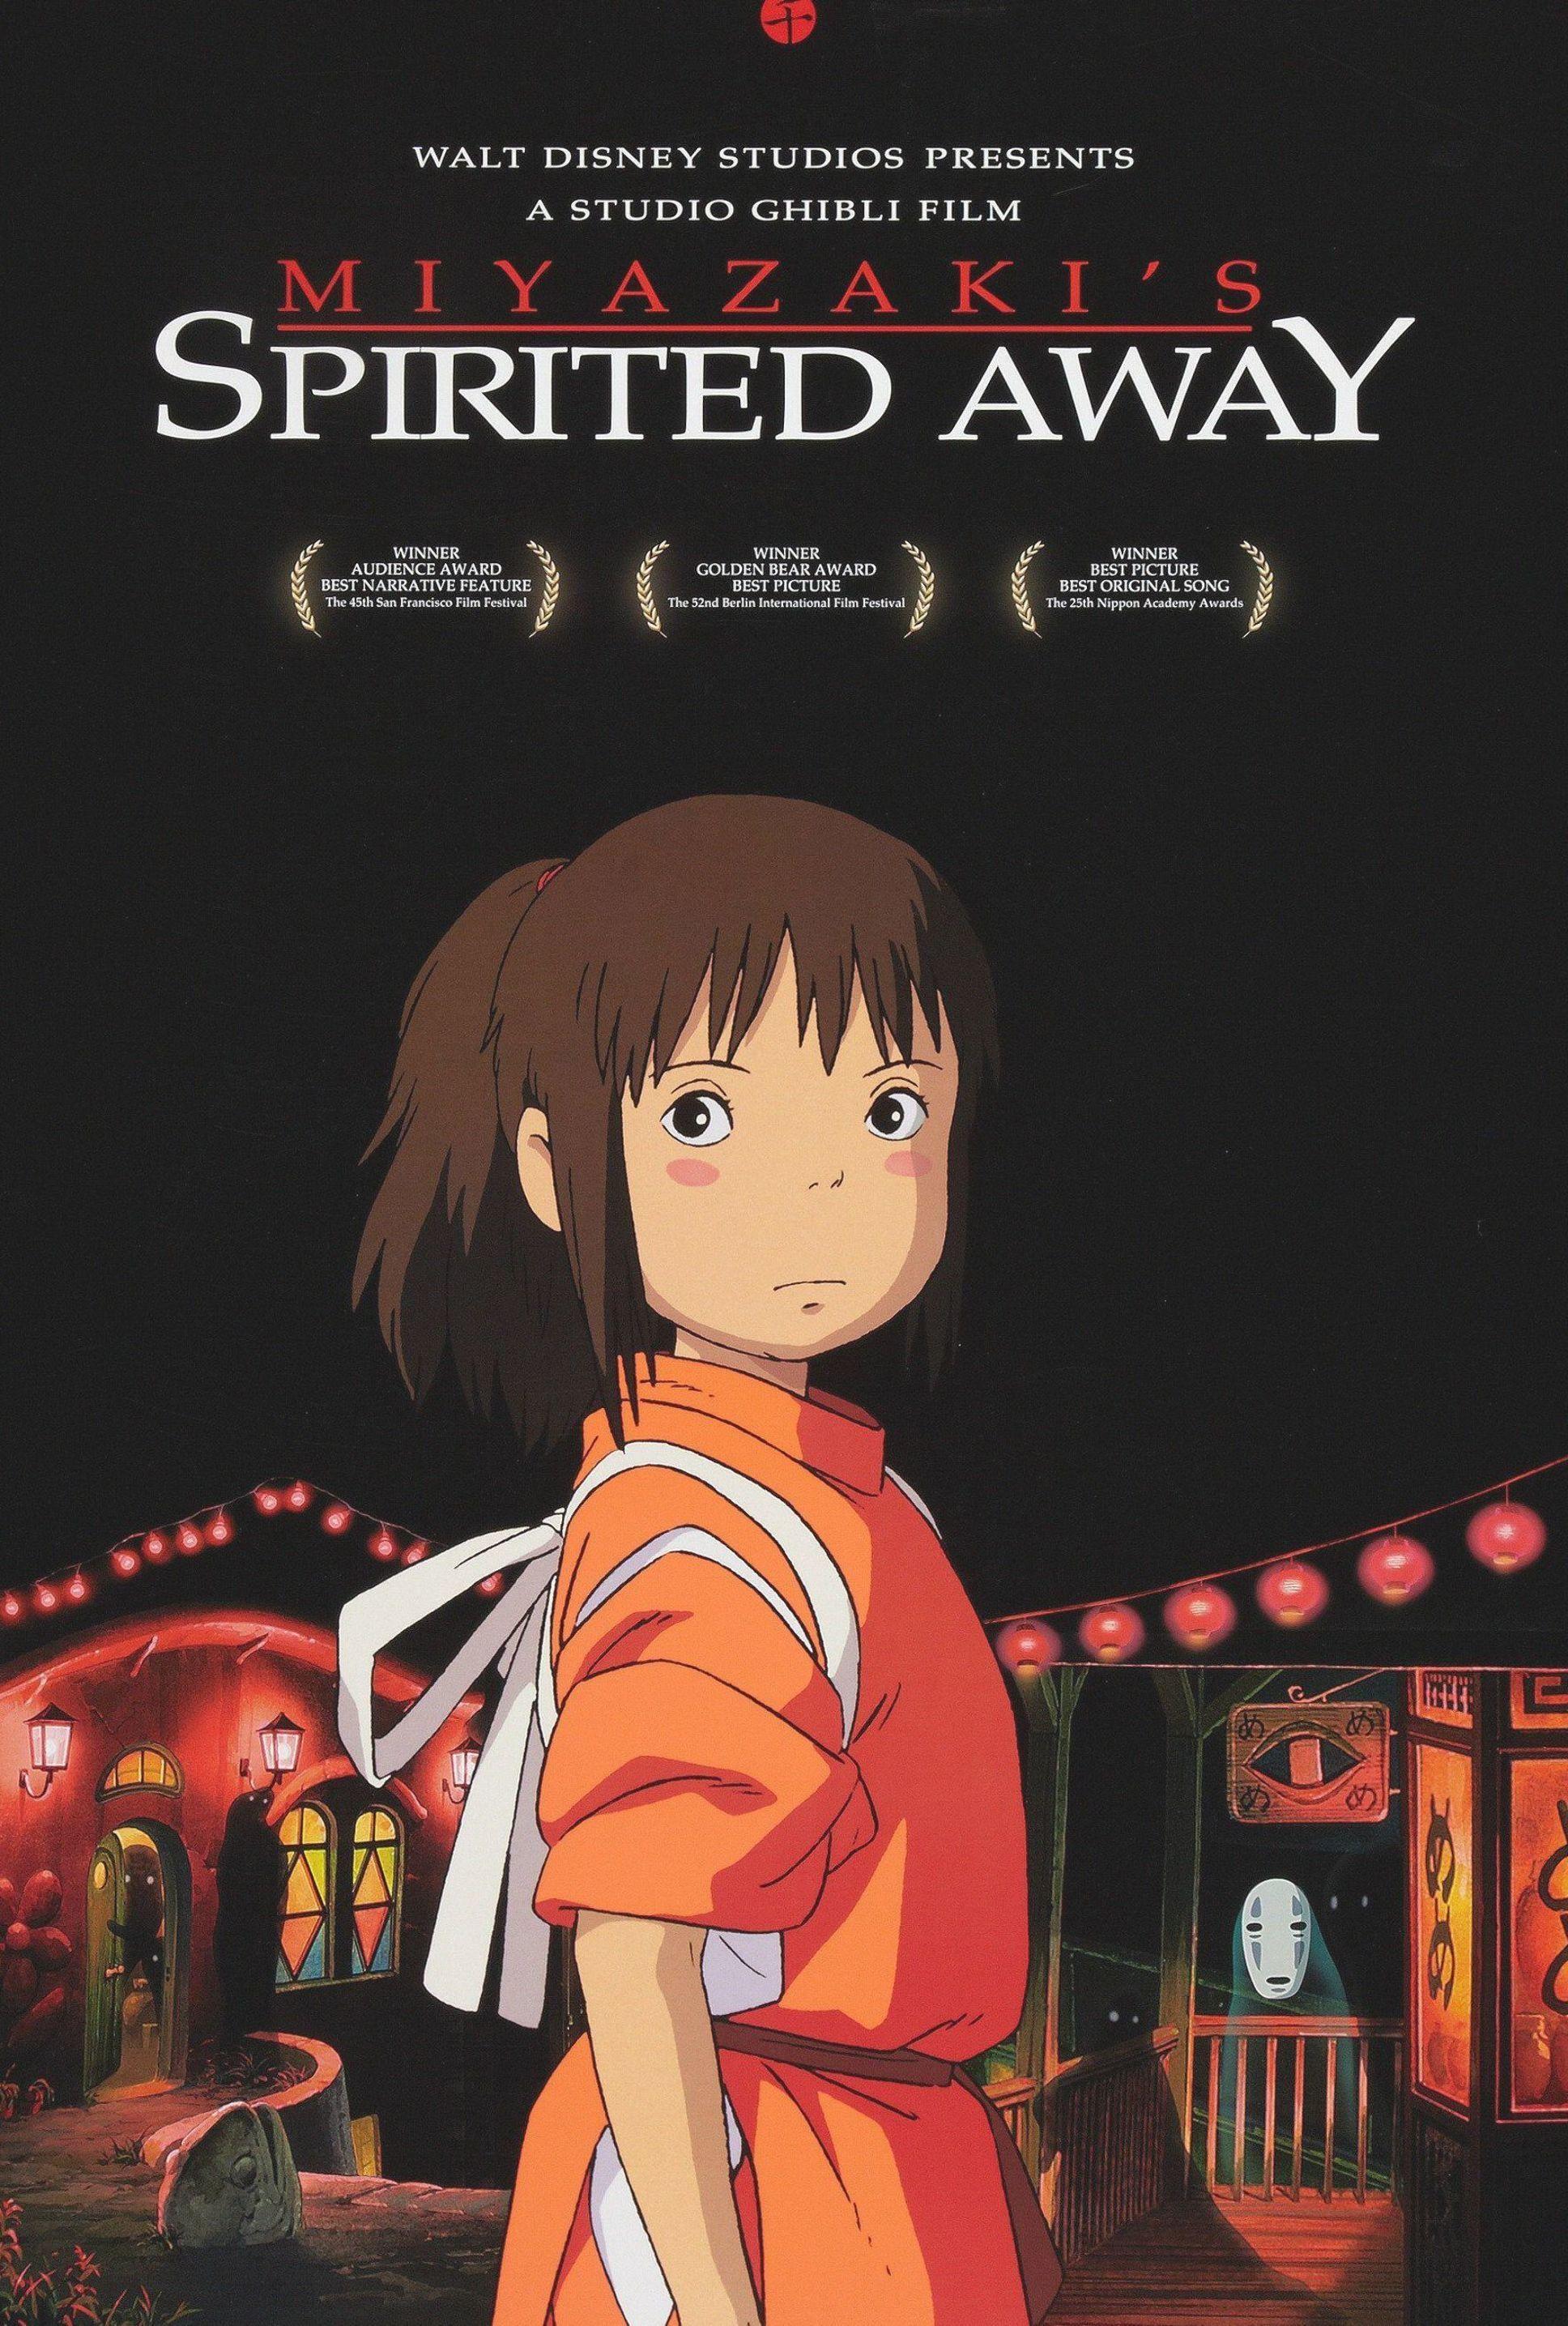 Studio Ghibli Spirited Away Animated Movie Poster Digital Download Studio Ghibli Poster Animated Movie Posters Studio Ghibli Spirited Away Anime movie art wallpaper